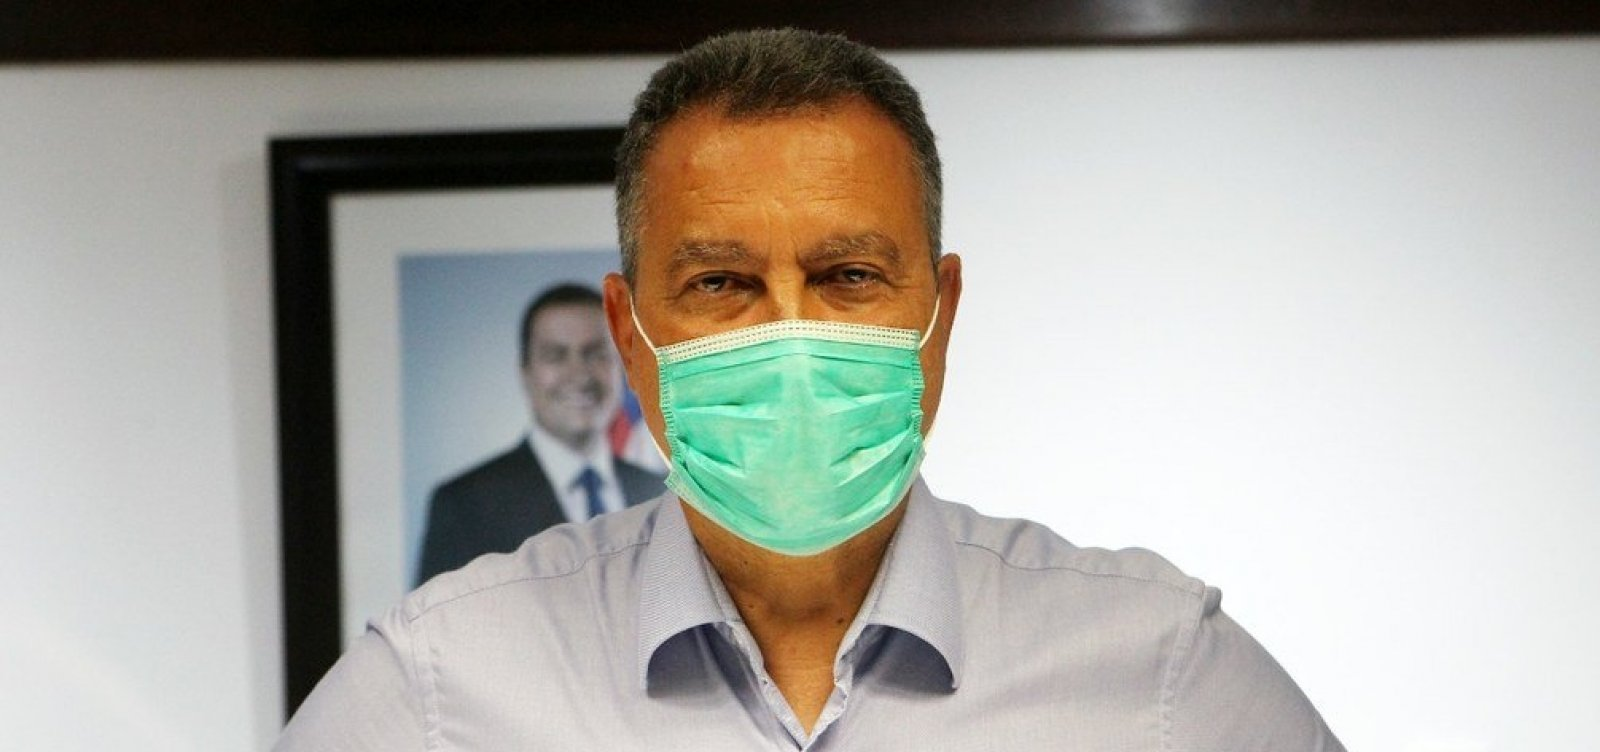 Uso de máscara será obrigatório para todos na Bahia, anuncia Rui Costa